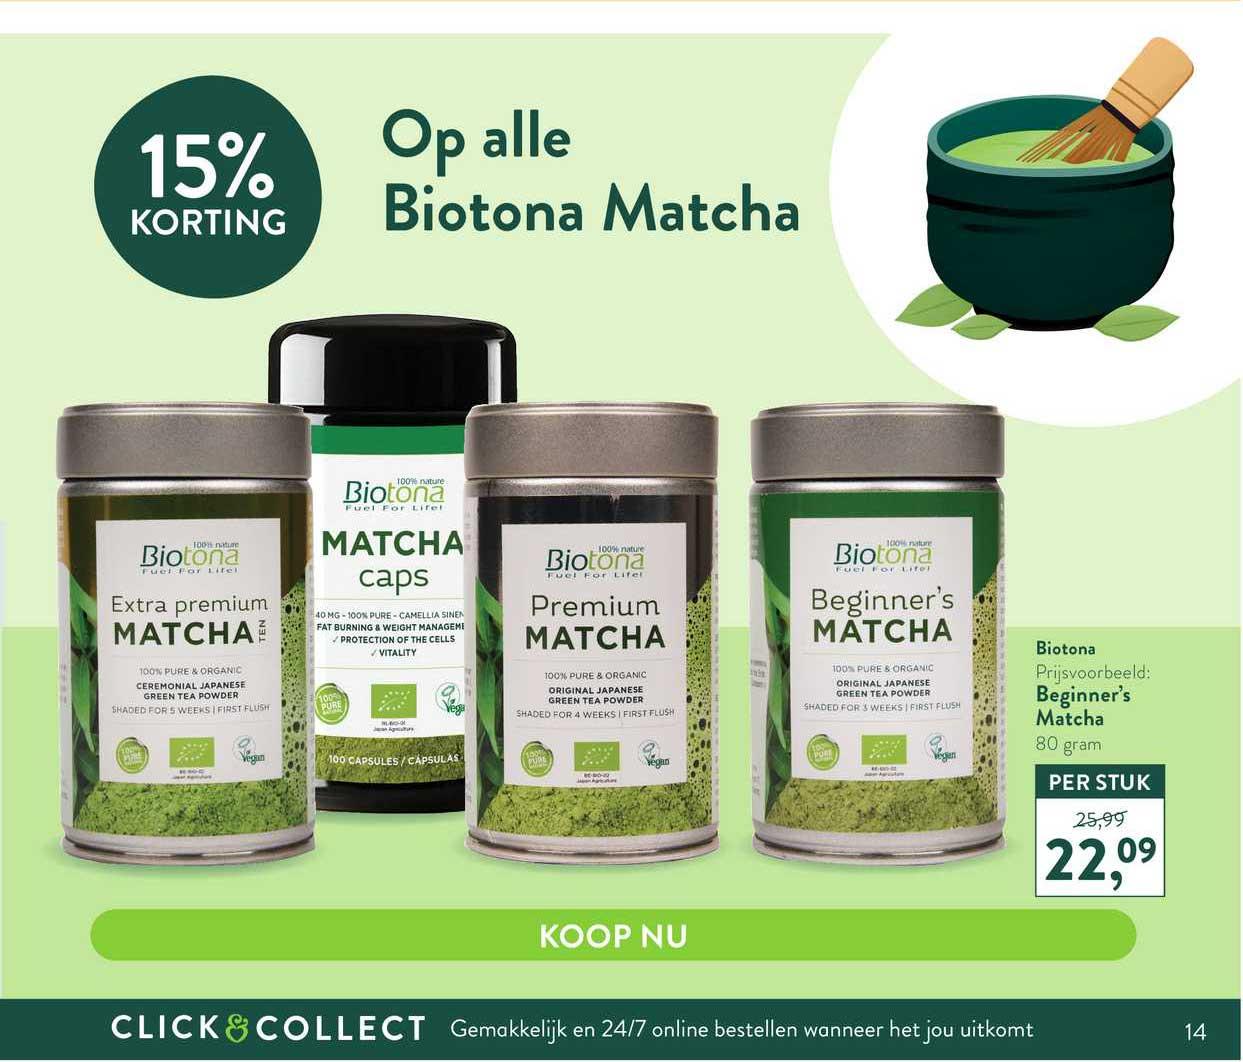 Holland & Barrett Op Alle Biotona Matcha 15% Korting